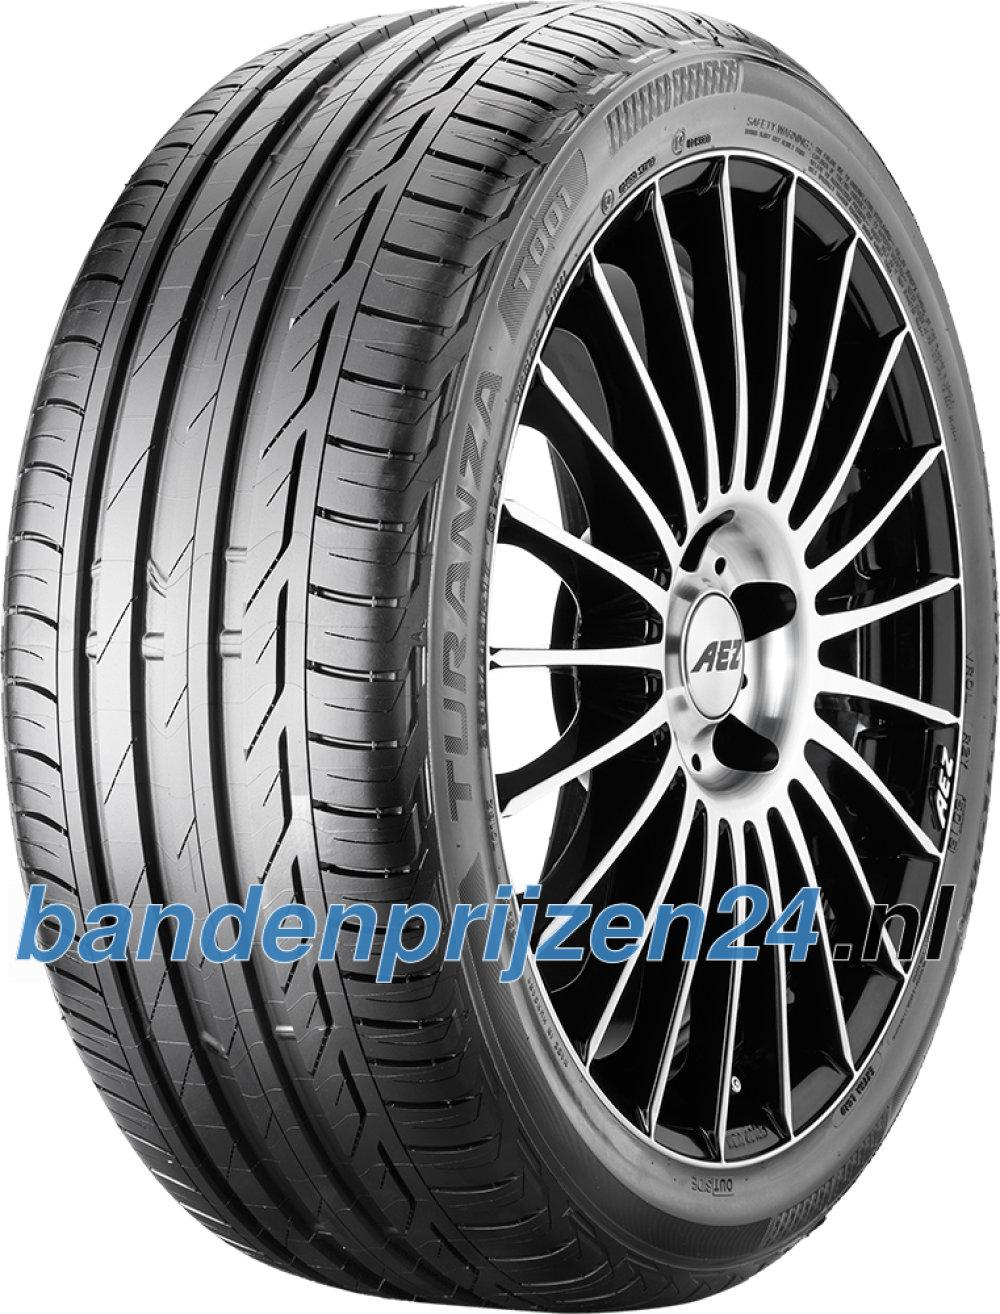 Bridgestone Turanza T001 Evo ( 215/50 R17 95W XL met velgrandbescherming (MFS) )